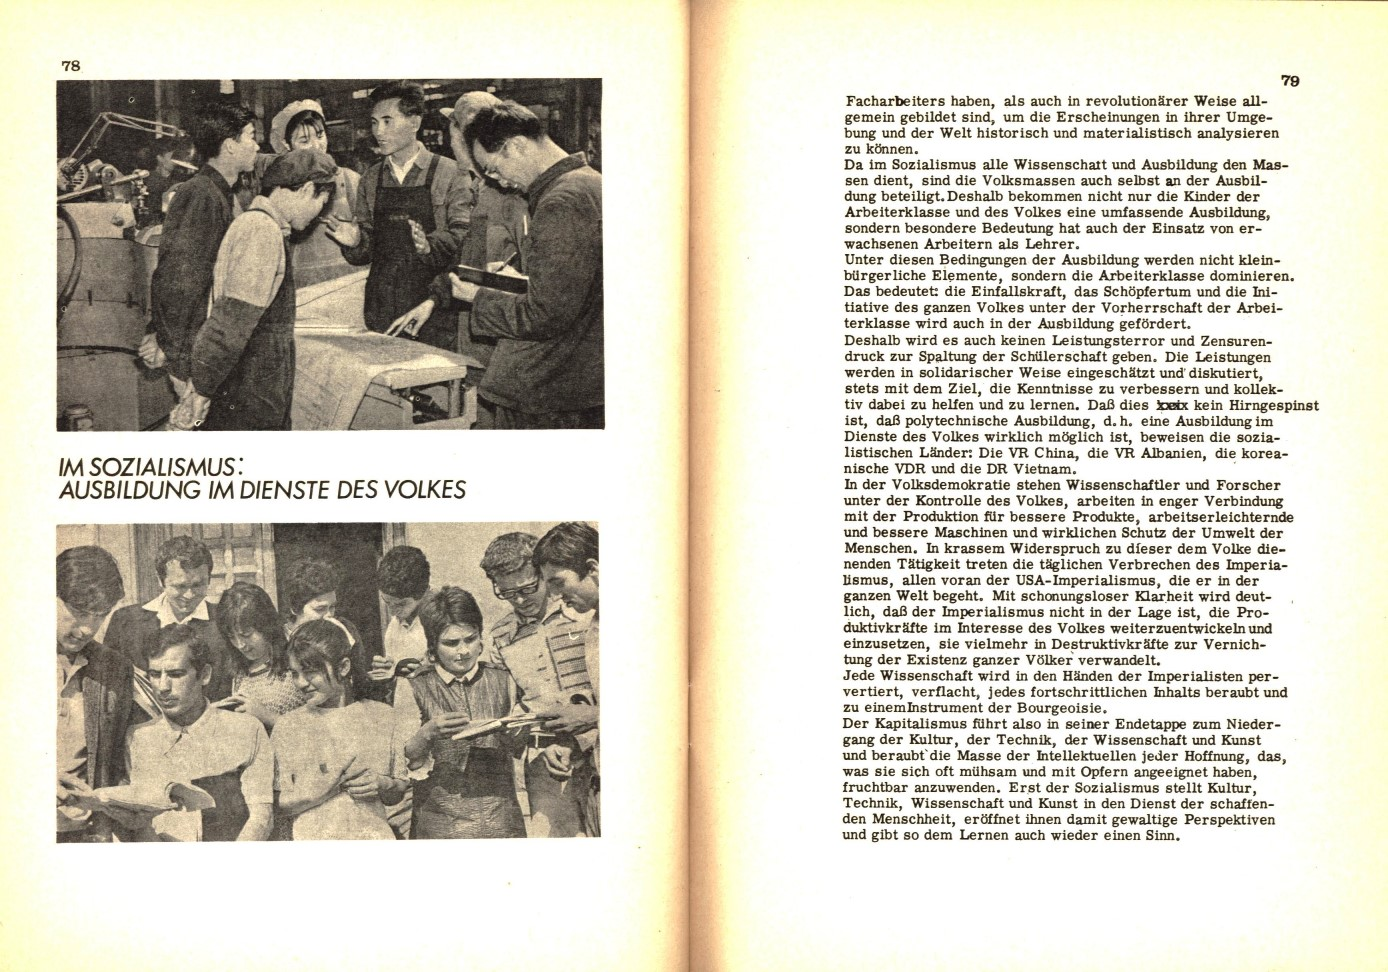 KOV_1973_Aktionsprogramm_42